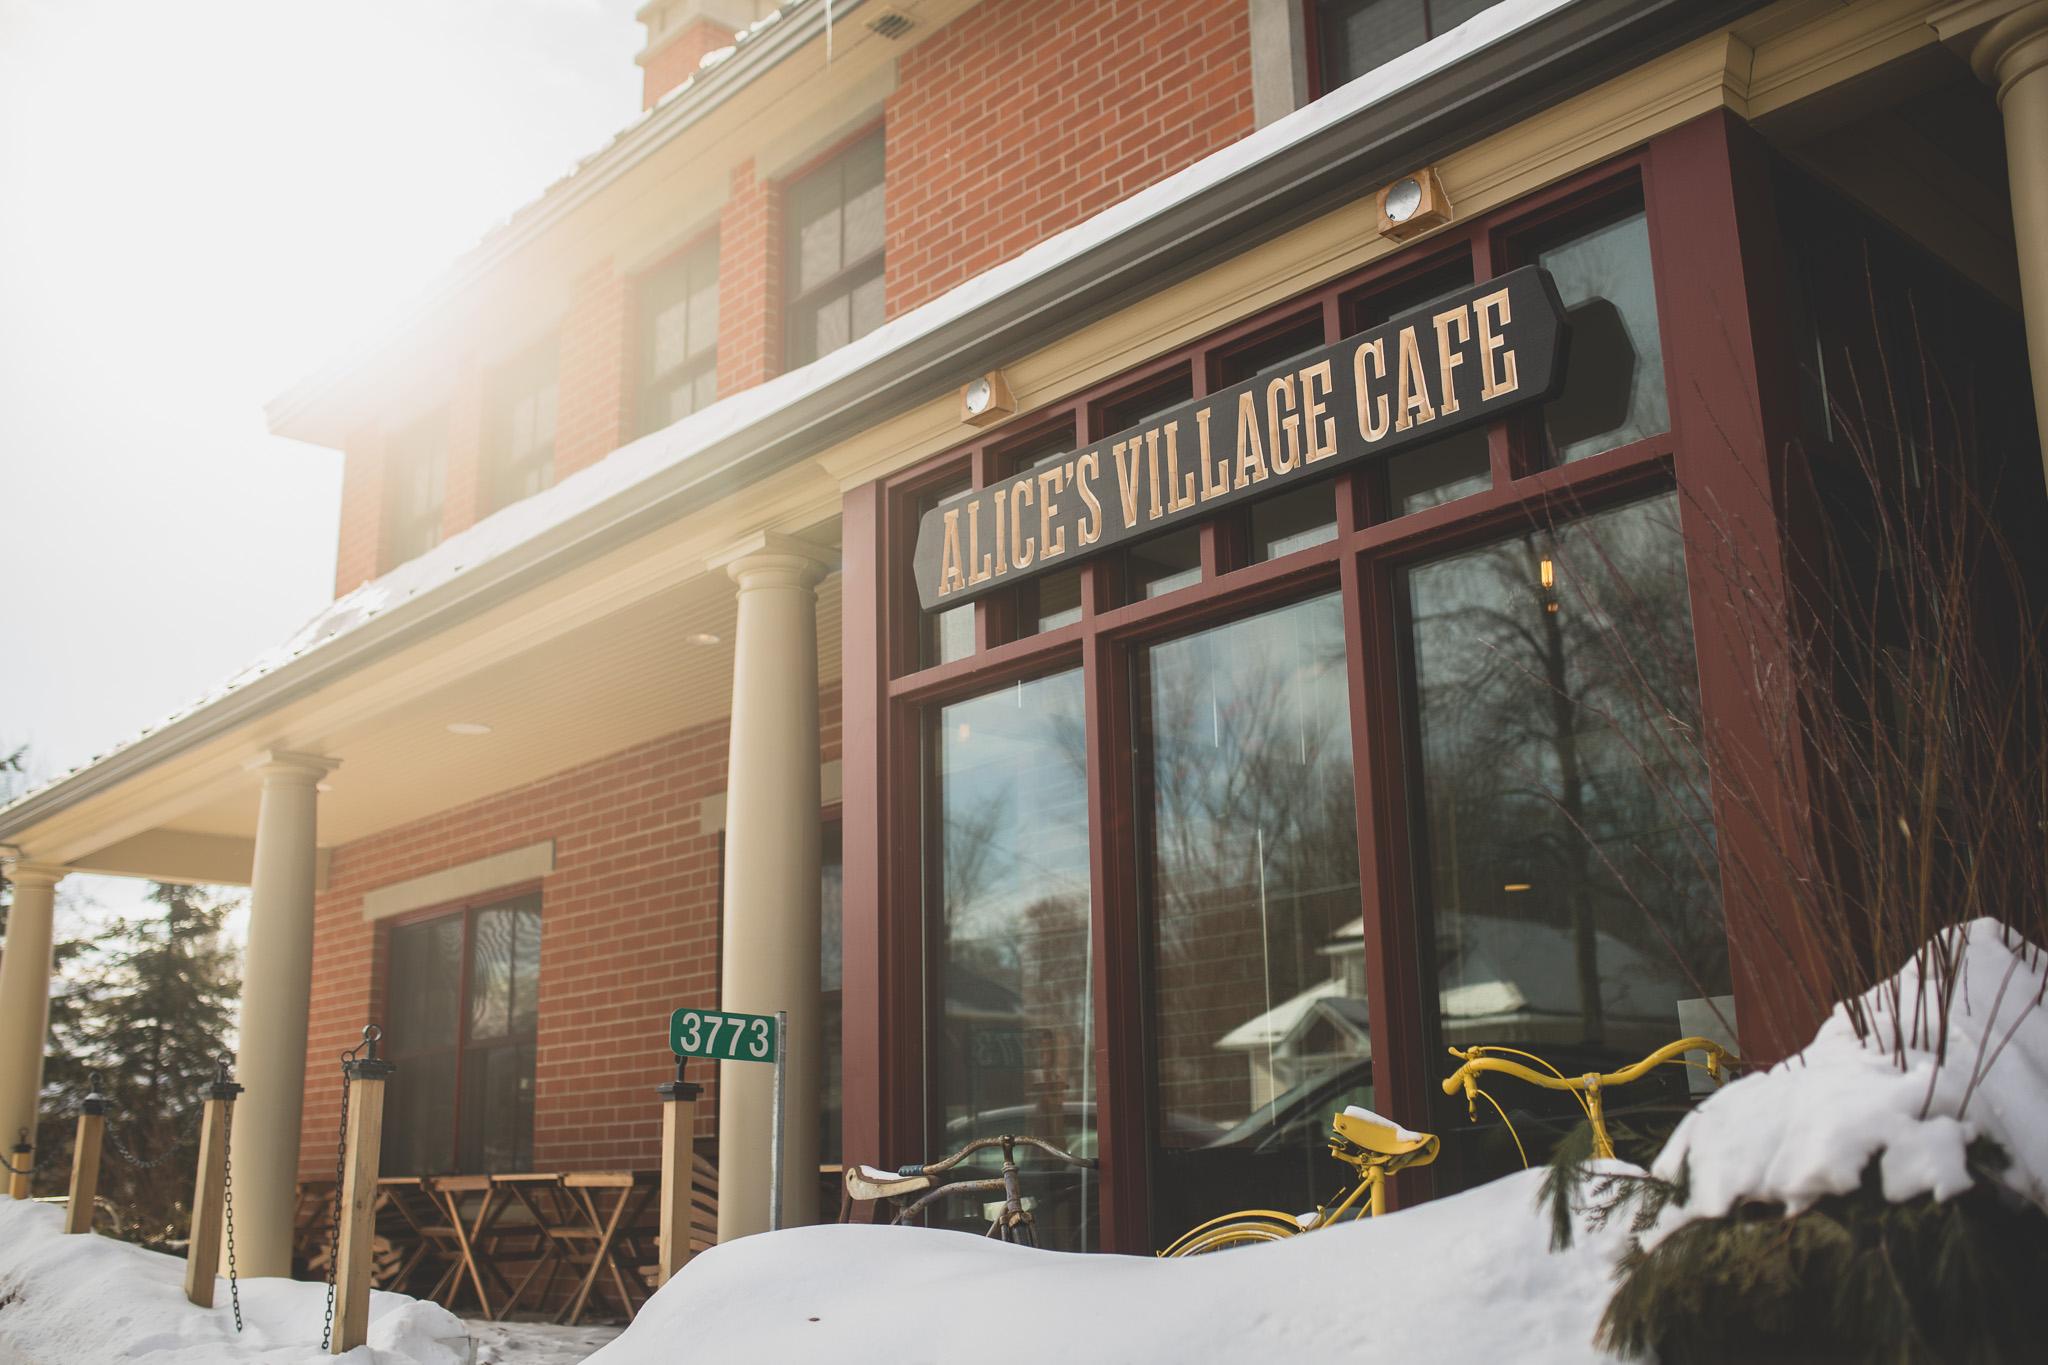 005-Jonathan-Kuhn-Photography-Alices Cafe Carp ON-2269.jpg